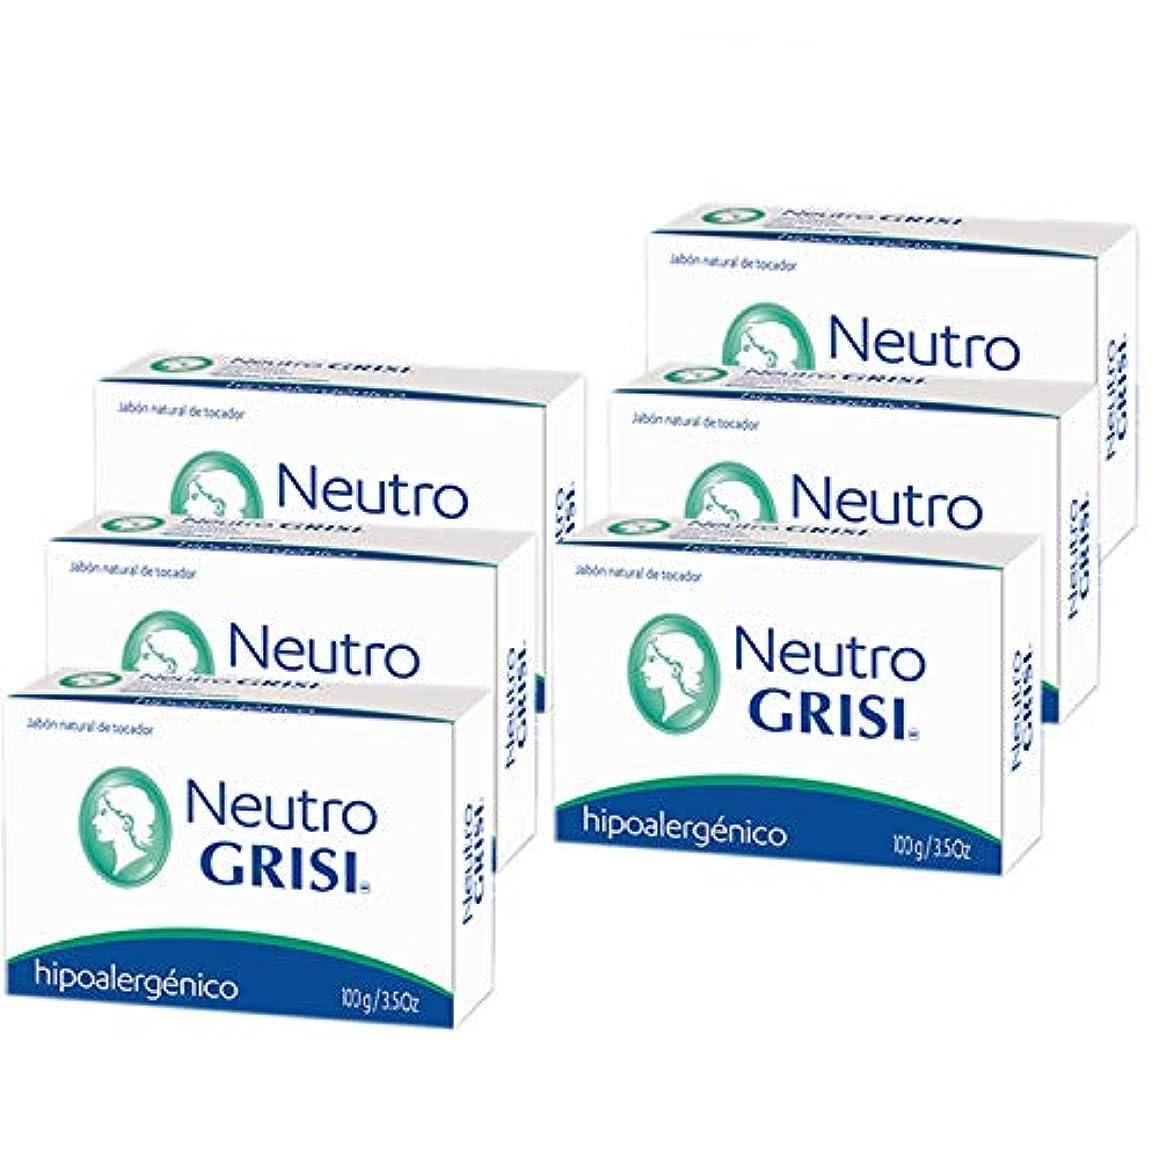 Grisi 6PK - 中性石鹸 - 低刺激性 - Jabon Neutro -